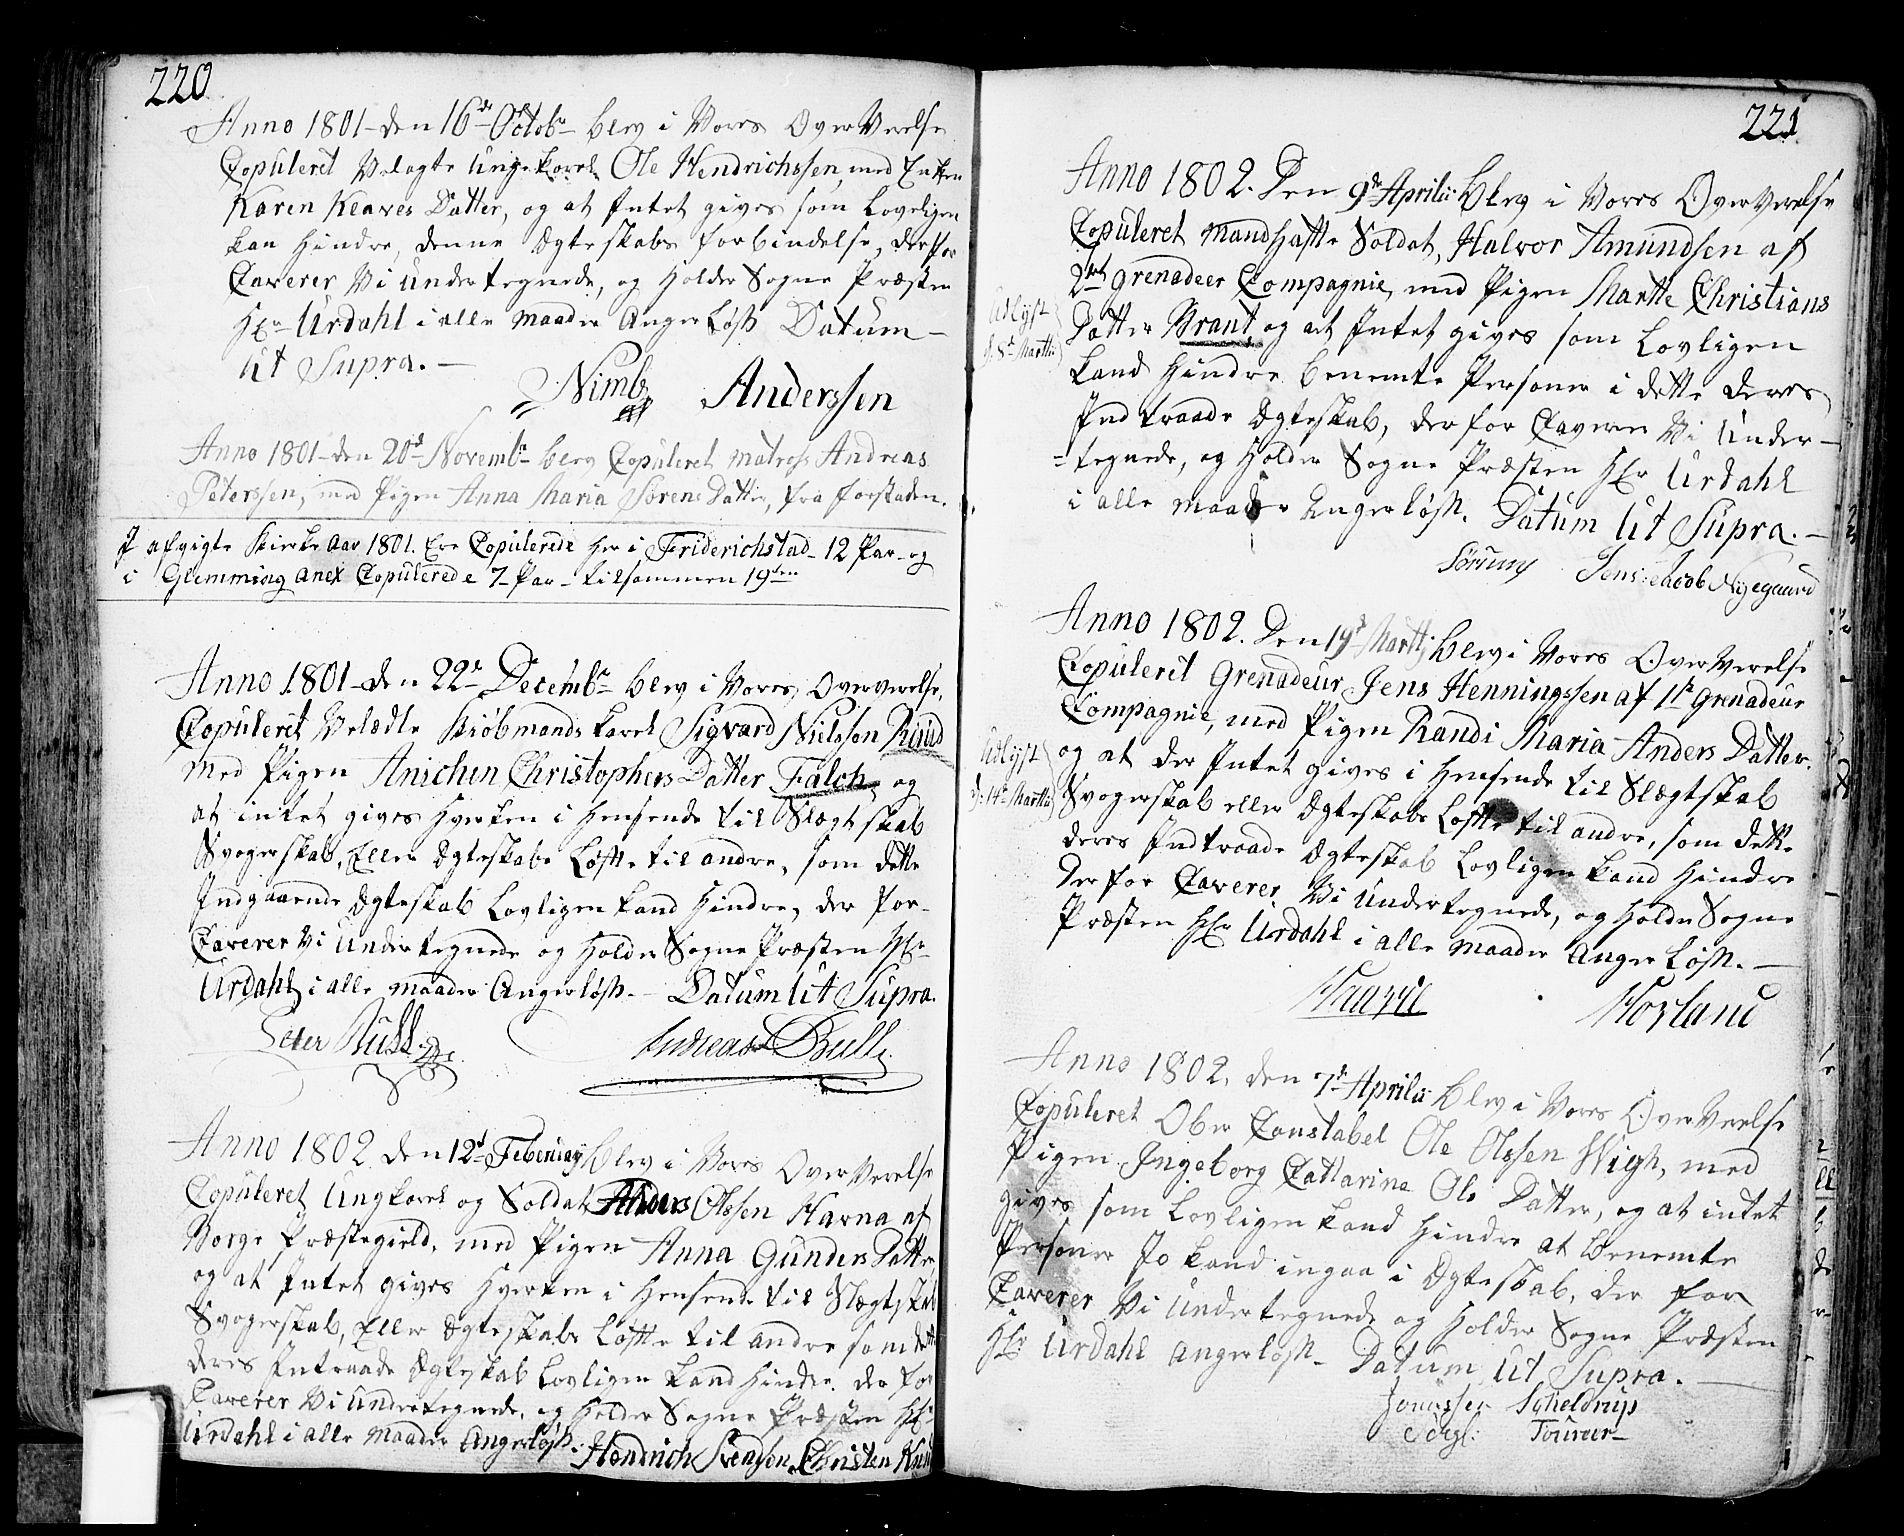 SAO, Fredrikstad prestekontor Kirkebøker, F/Fa/L0002: Ministerialbok nr. 2, 1750-1804, s. 220-221